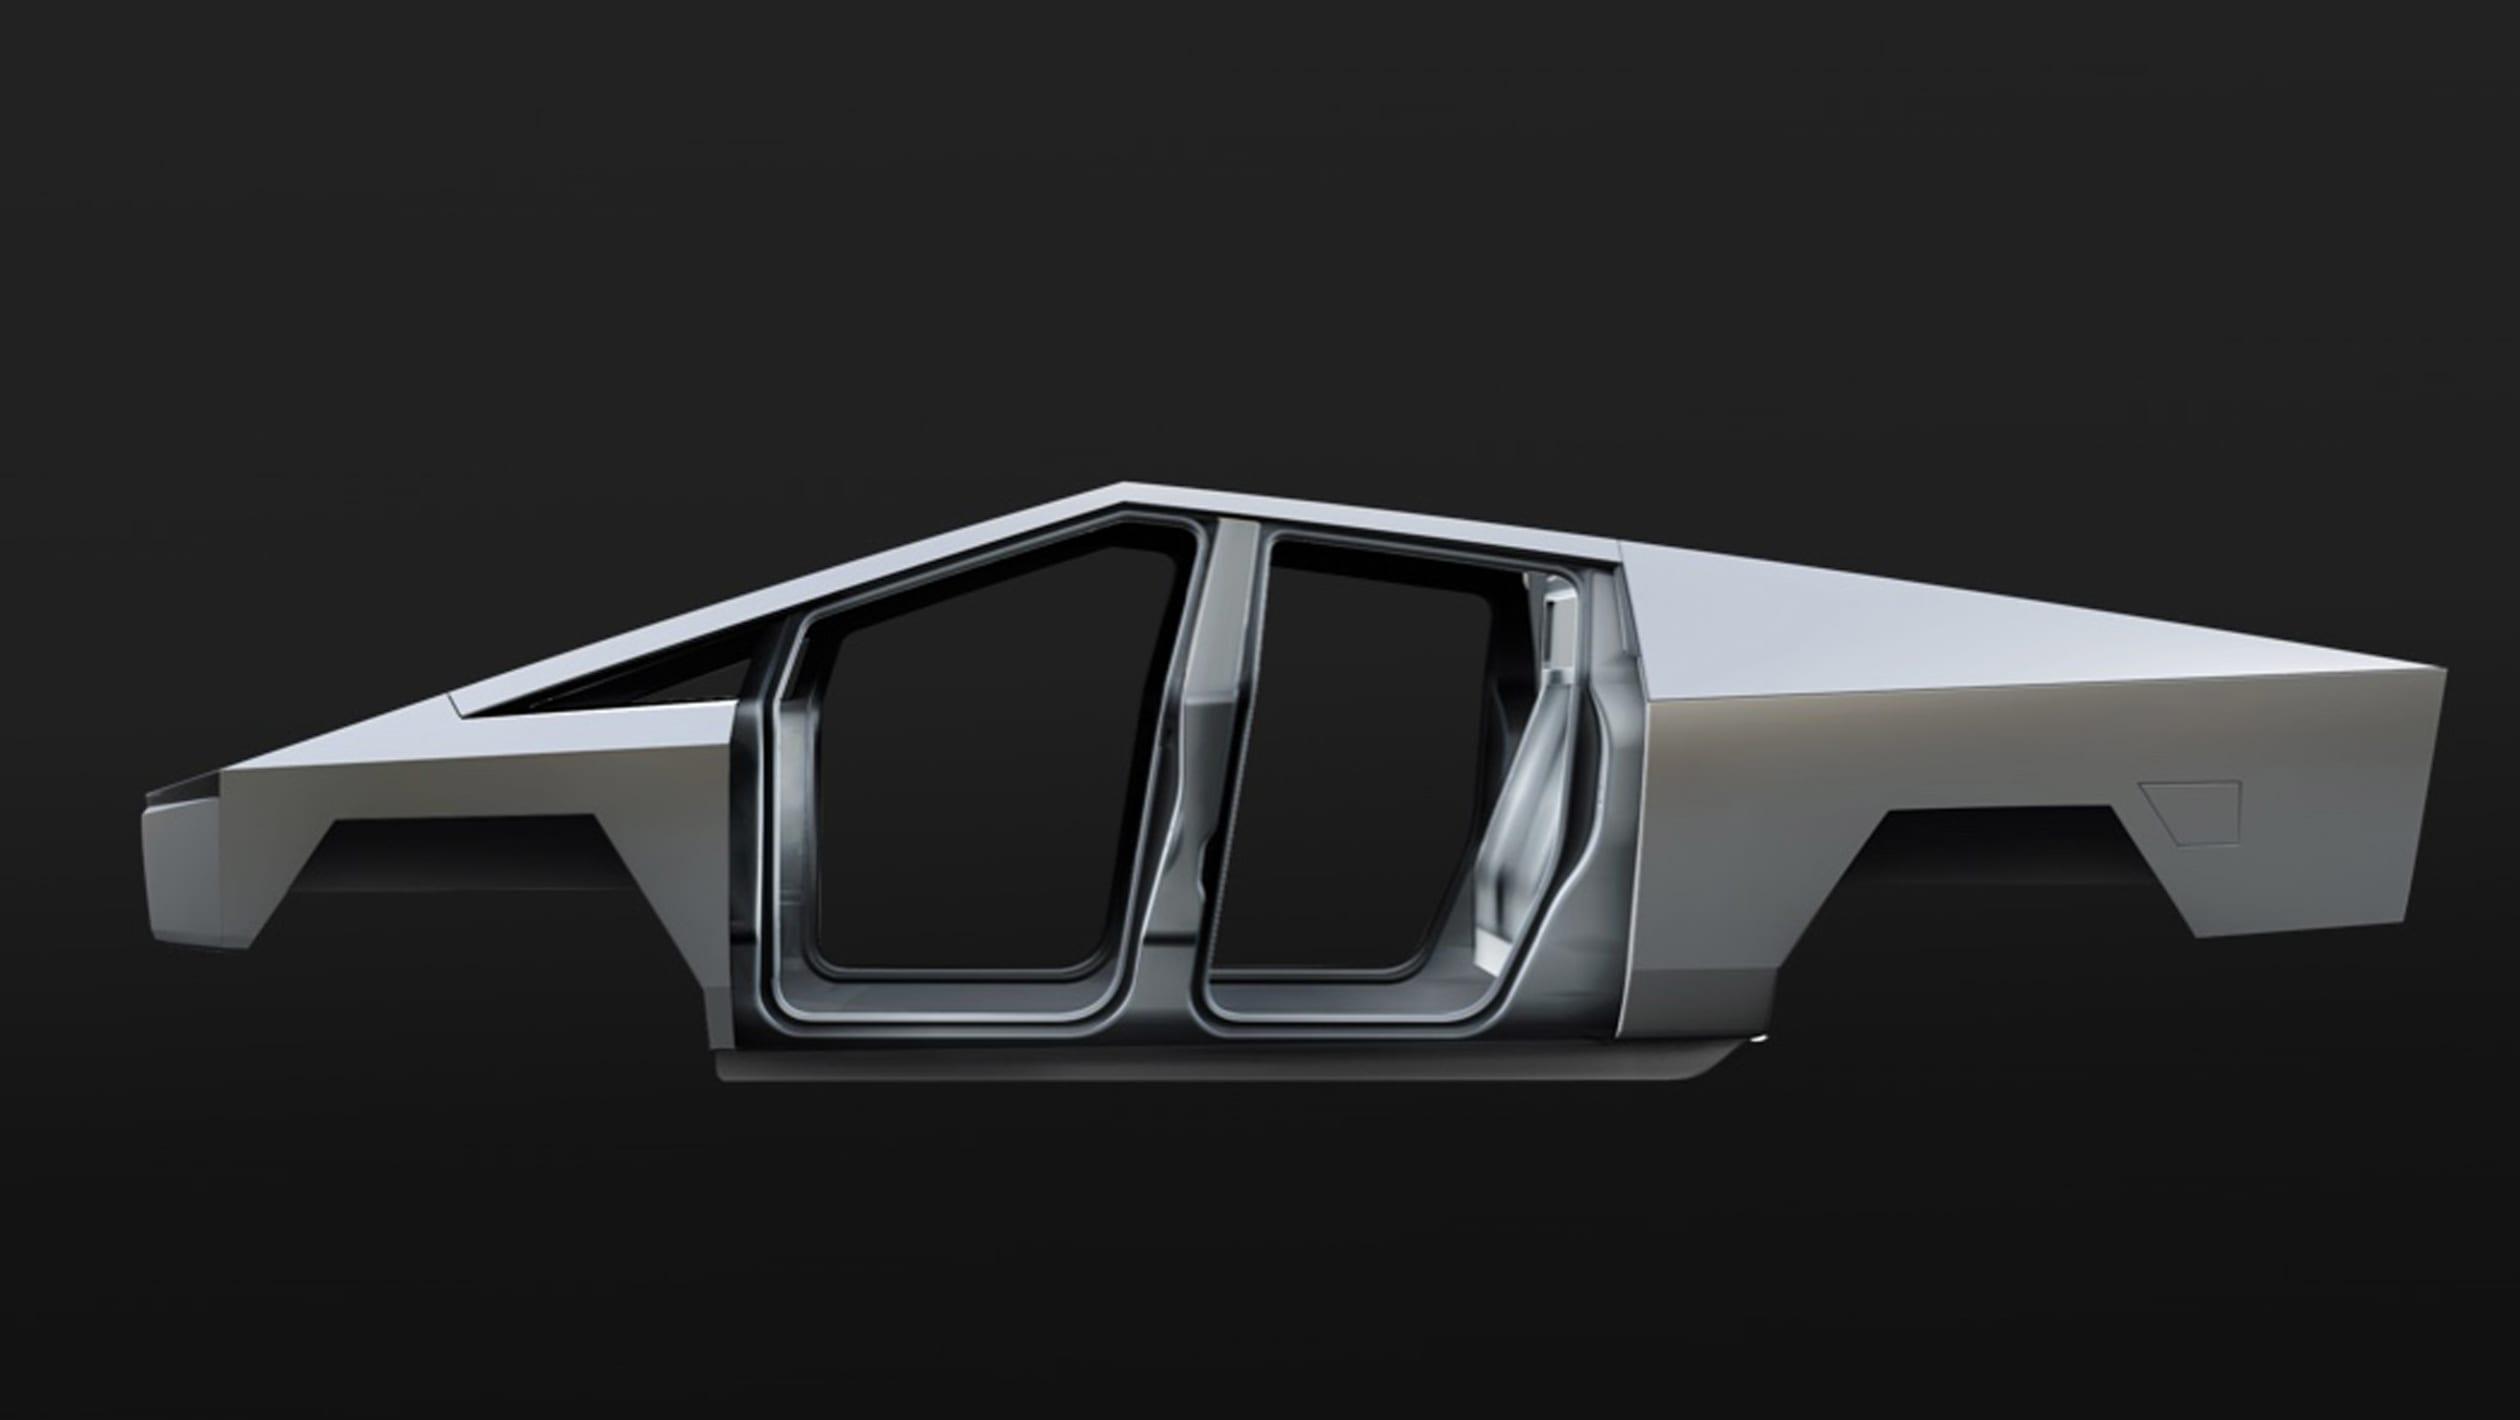 Review Tesla's Cybertruck pick-up